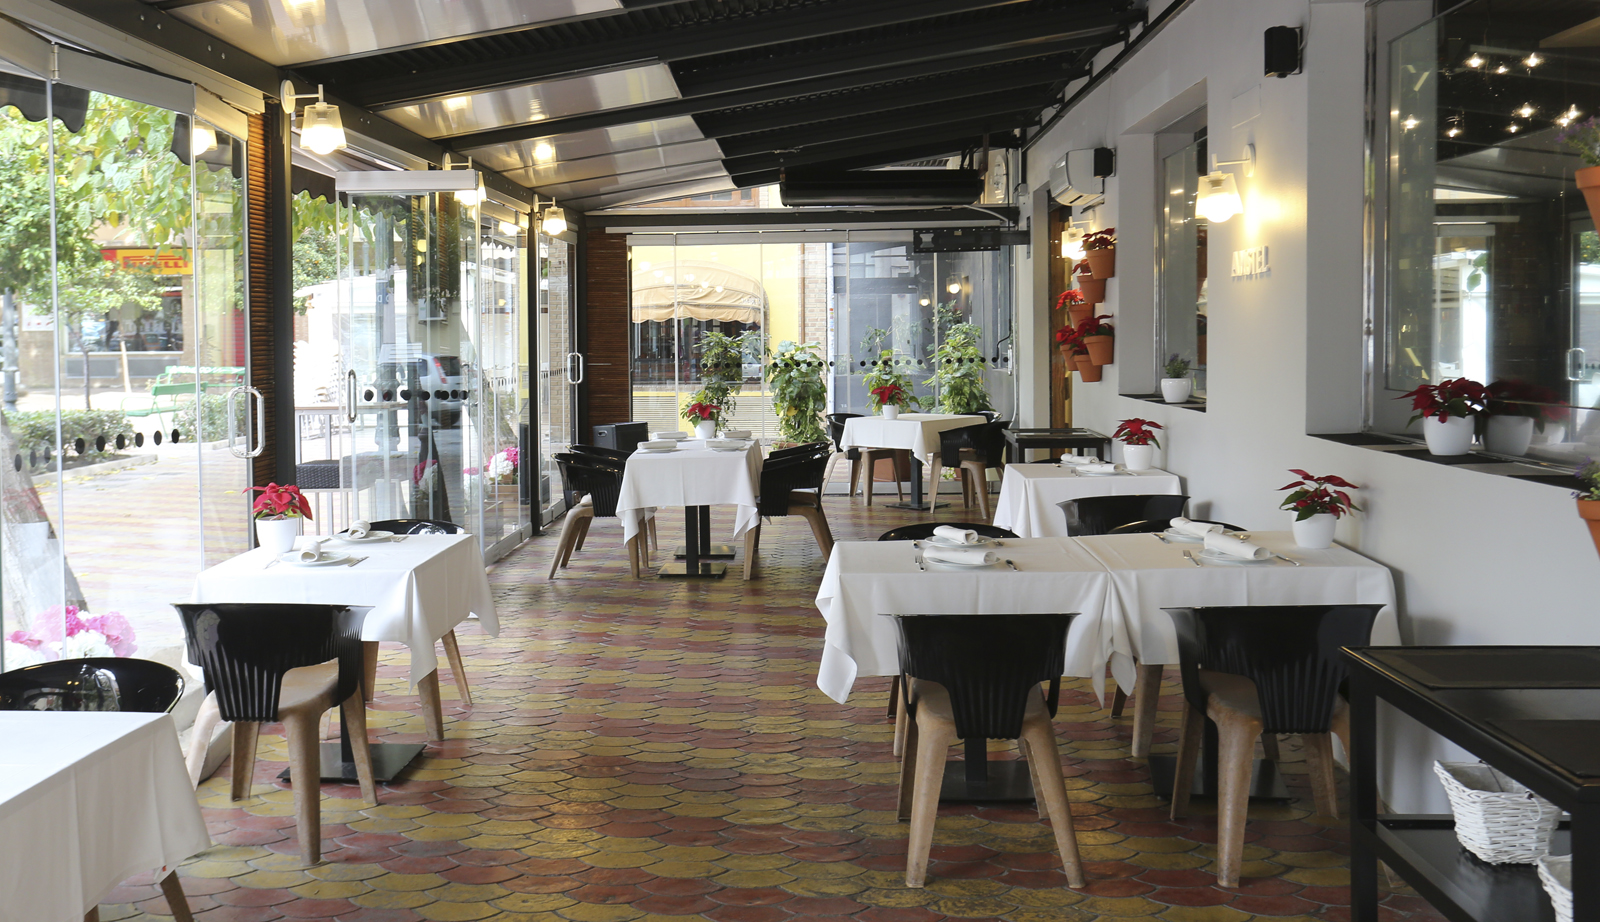 Restaurante Alejandro del Toro, Valencia